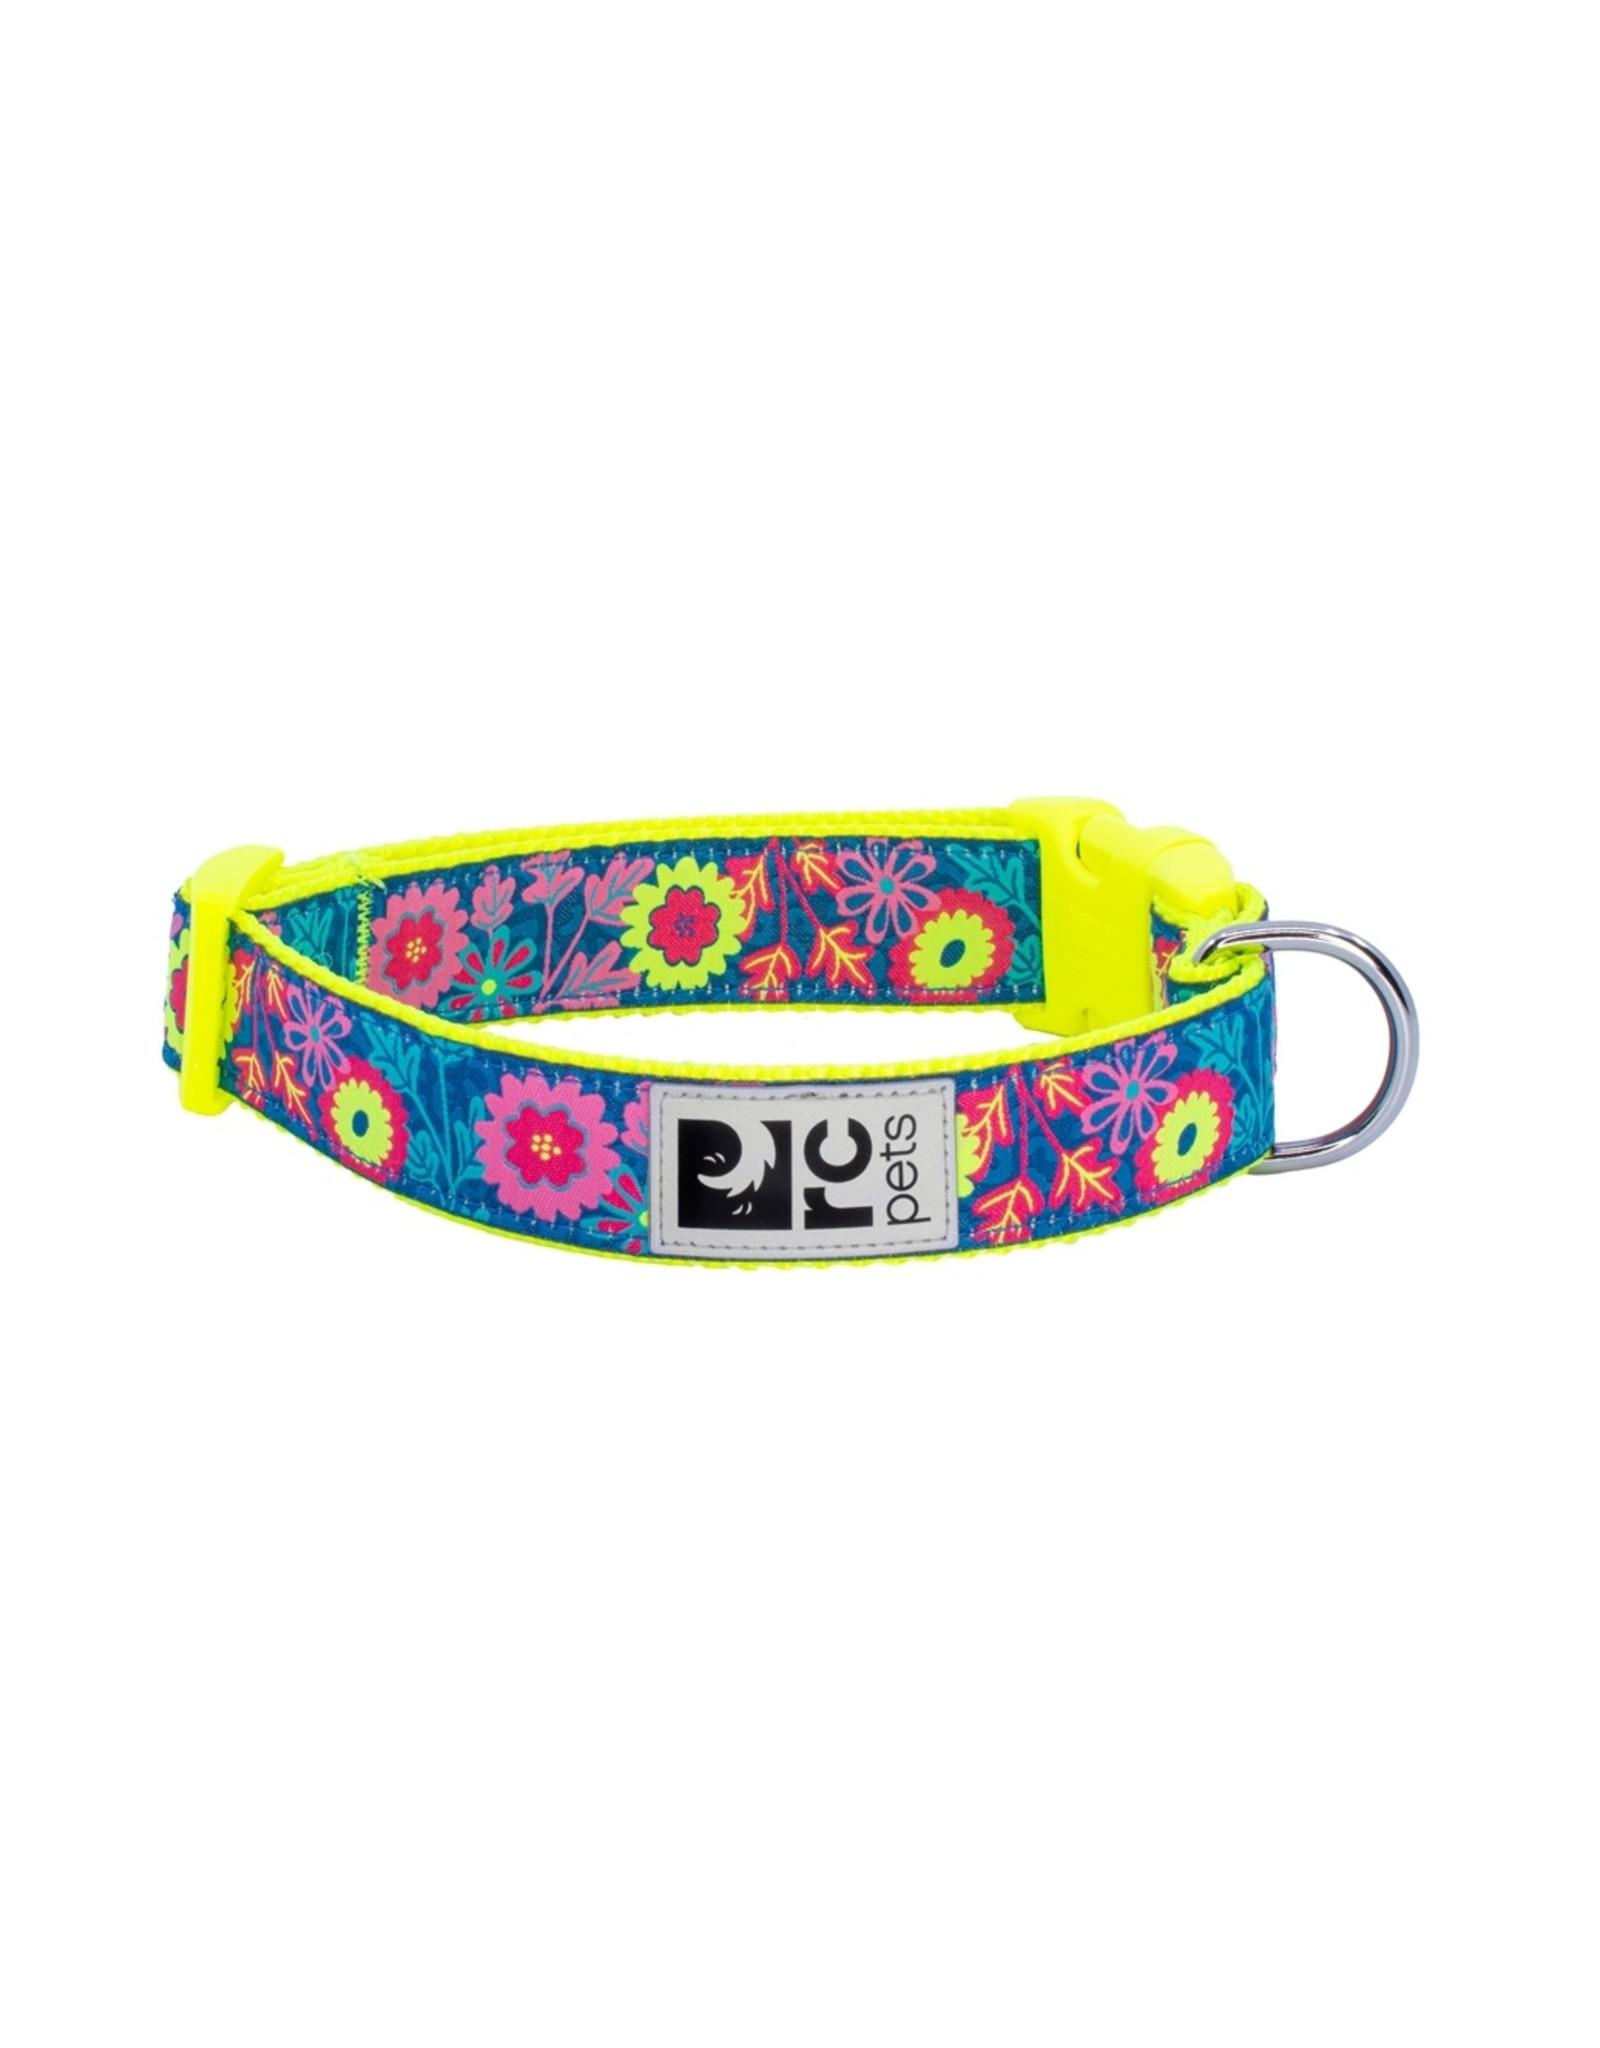 RC Pets Clip Collar - Flower Power